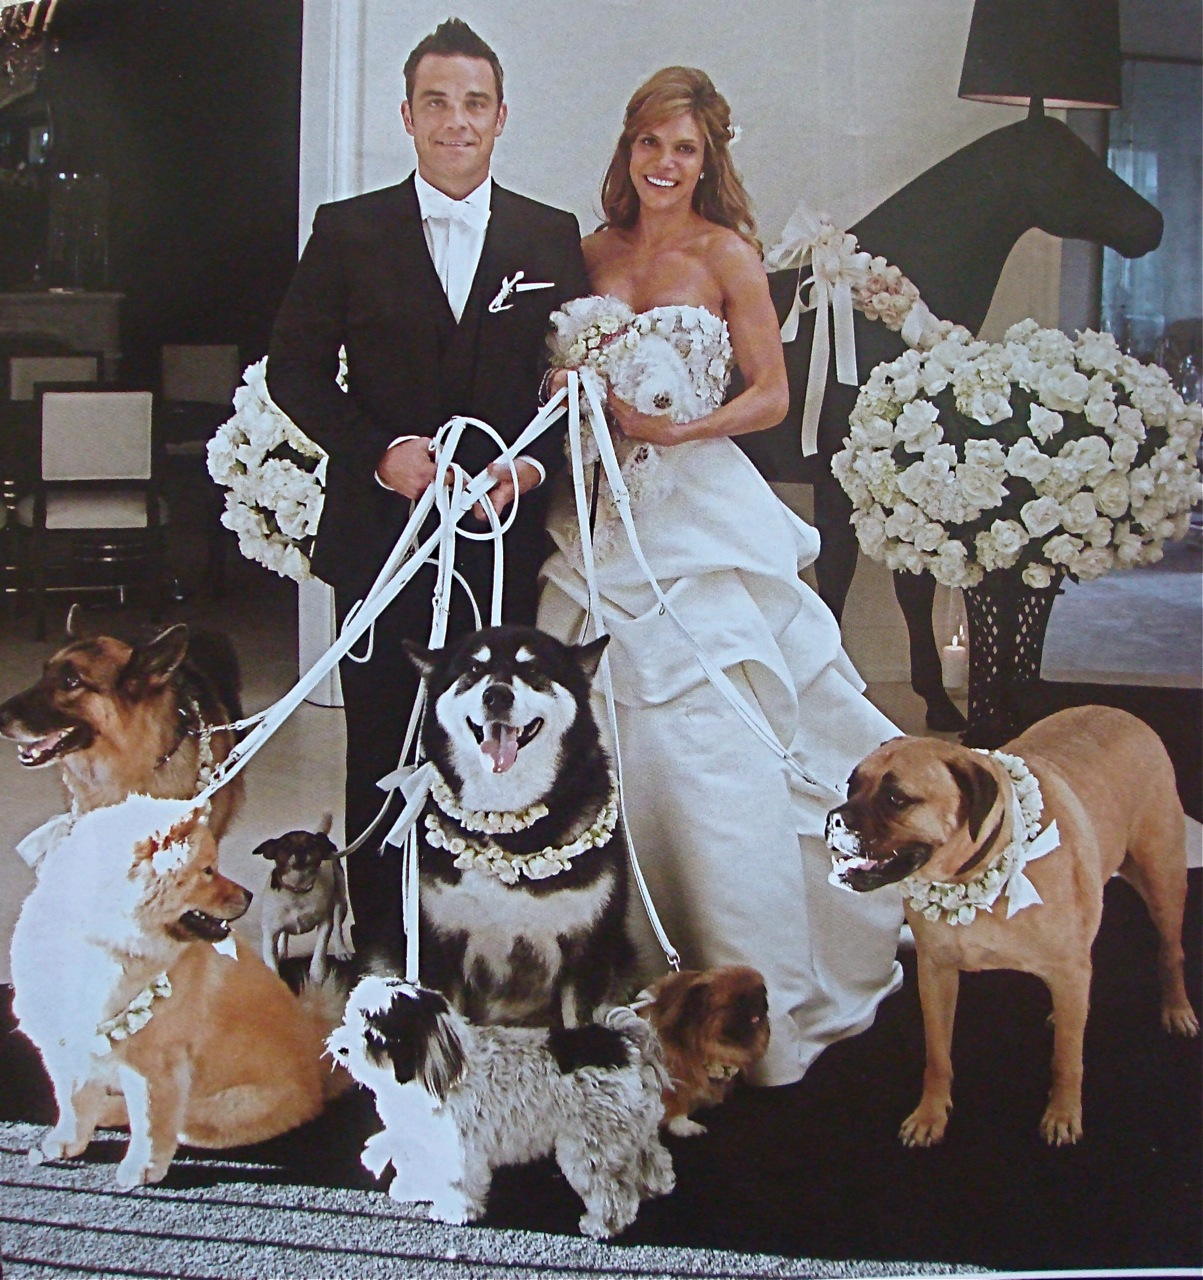 http://2.bp.blogspot.com/_WV0BsMcY10Y/THXODtEs0sI/AAAAAAAAHuQ/7vU7g0xUfM0/s1600/dogs.jpg